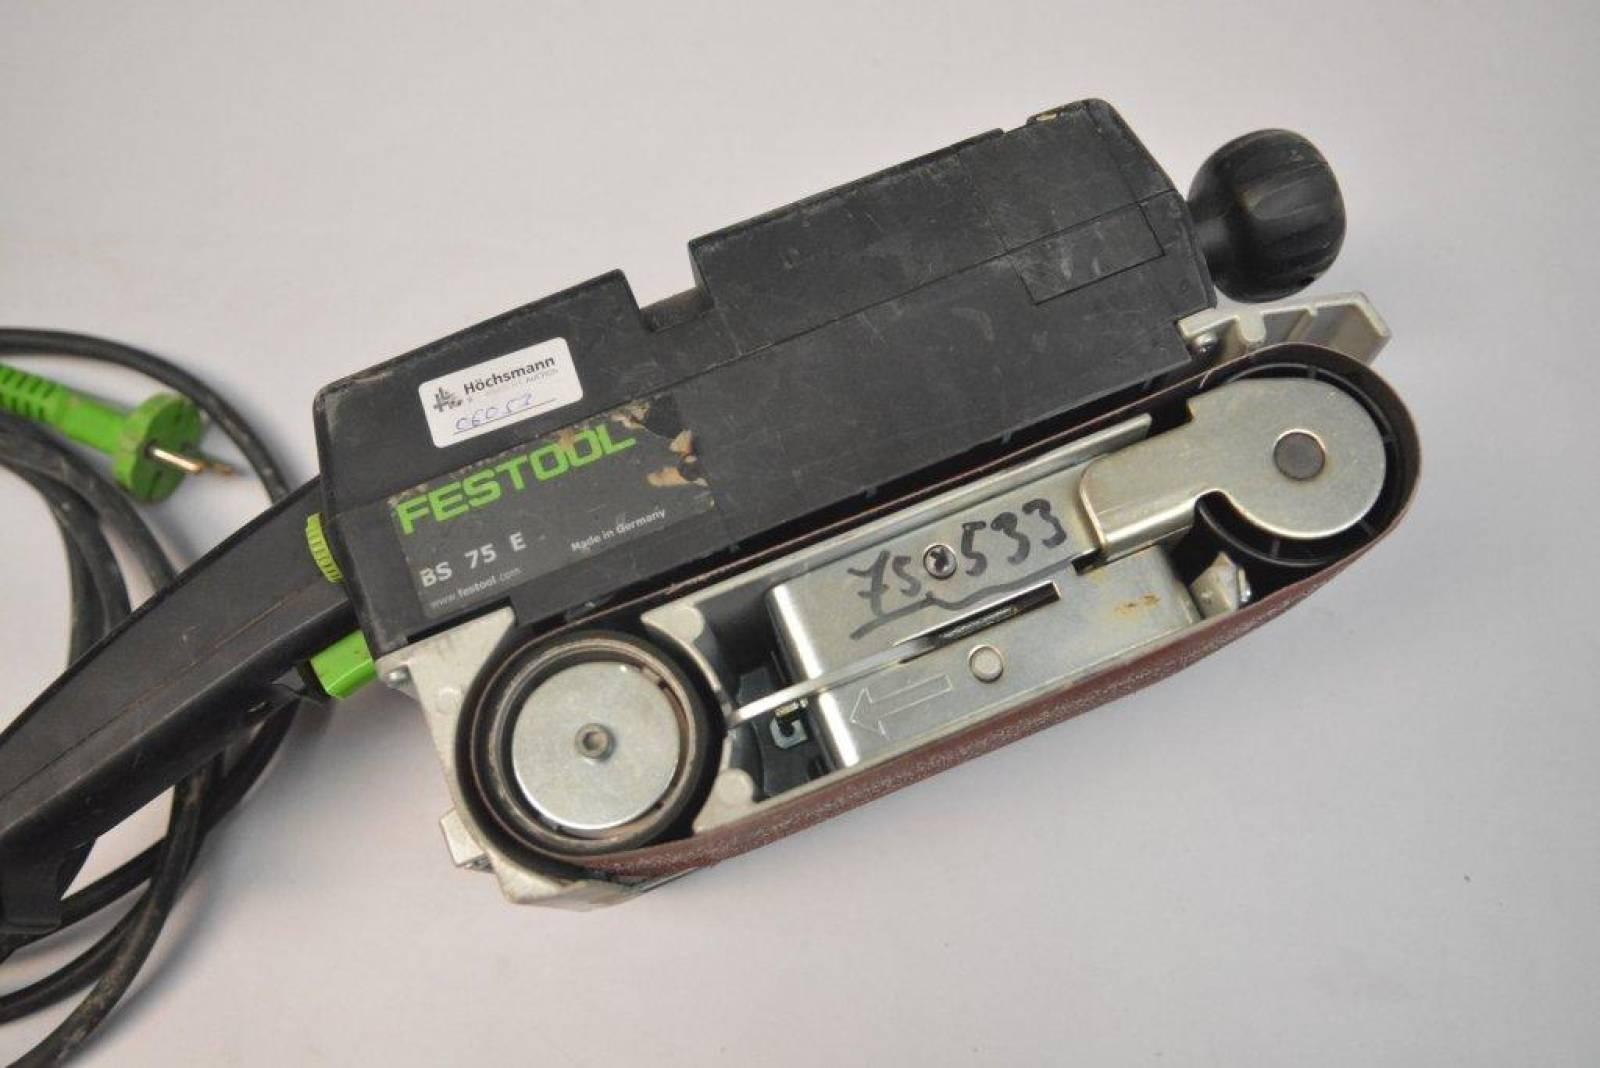 power tool festool bs 75 e buy second-hand